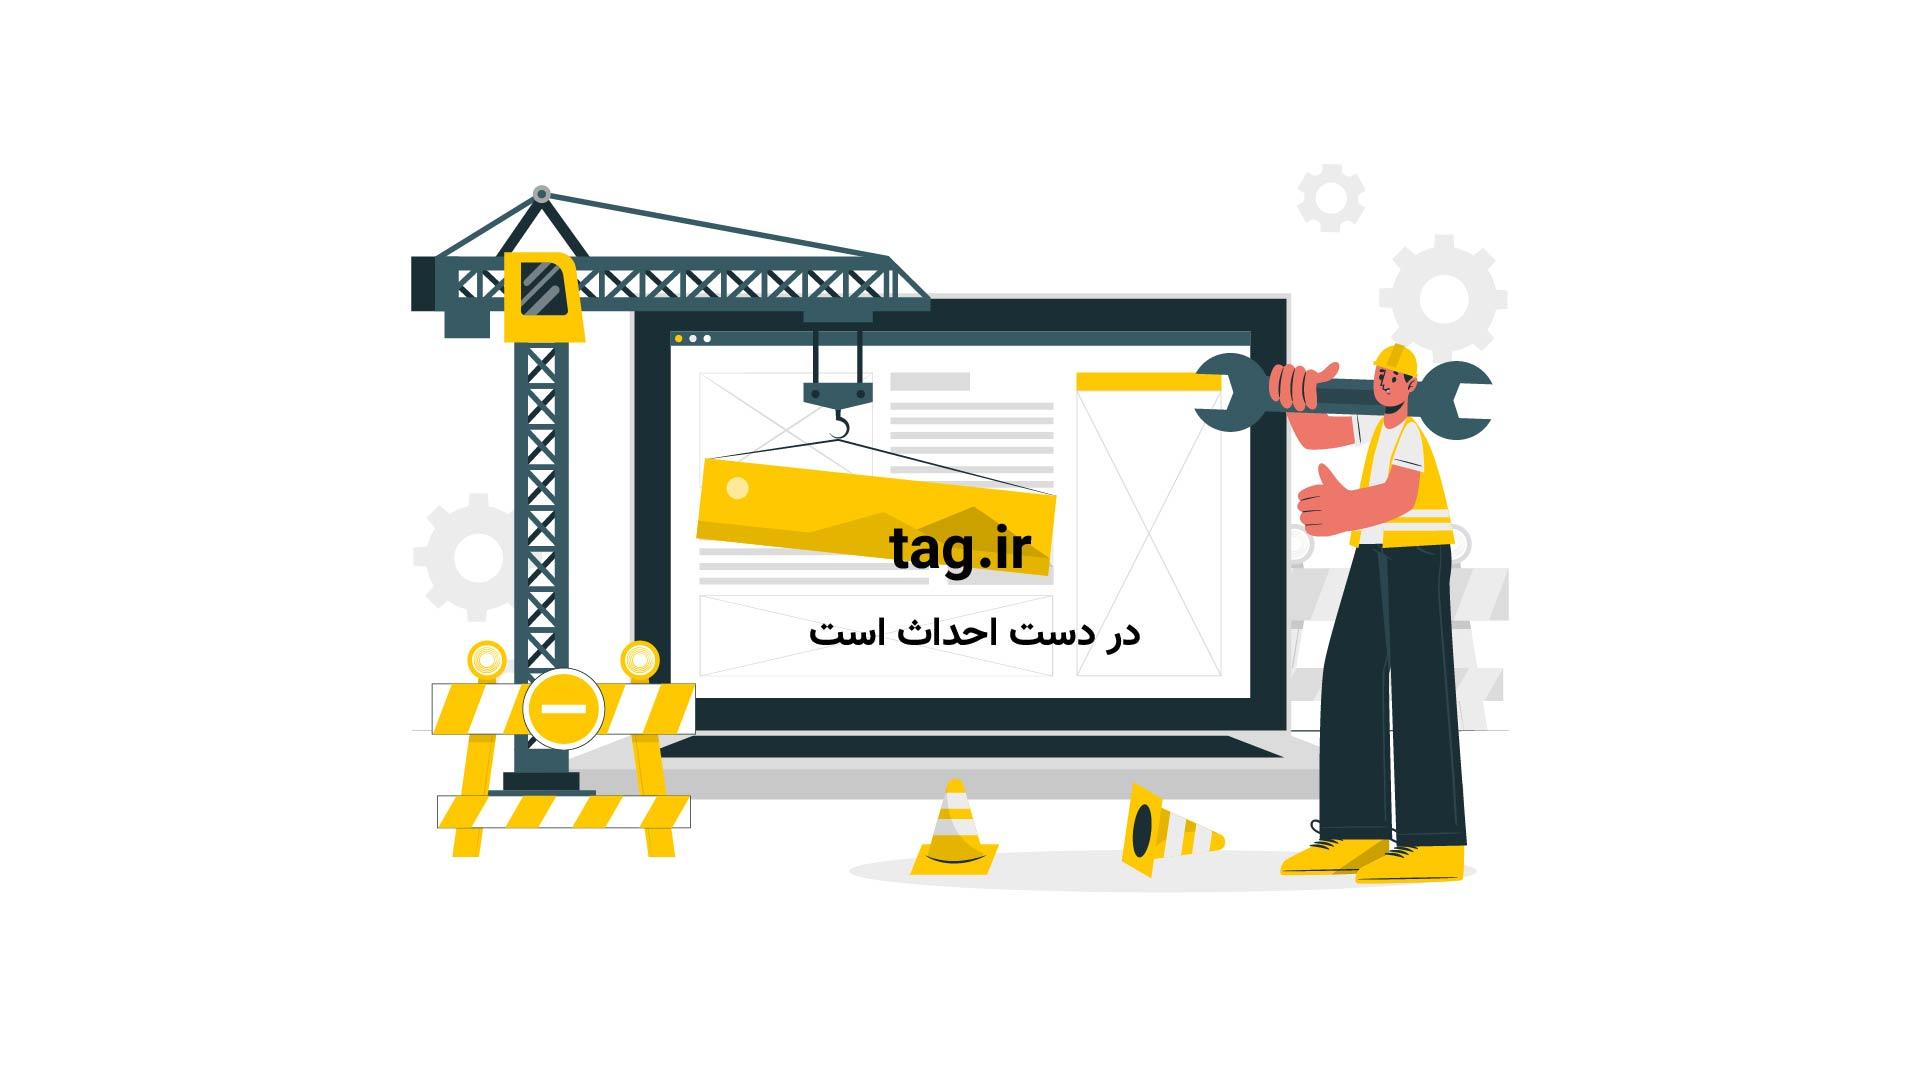 نبرد شیر و بوفالو | تگ